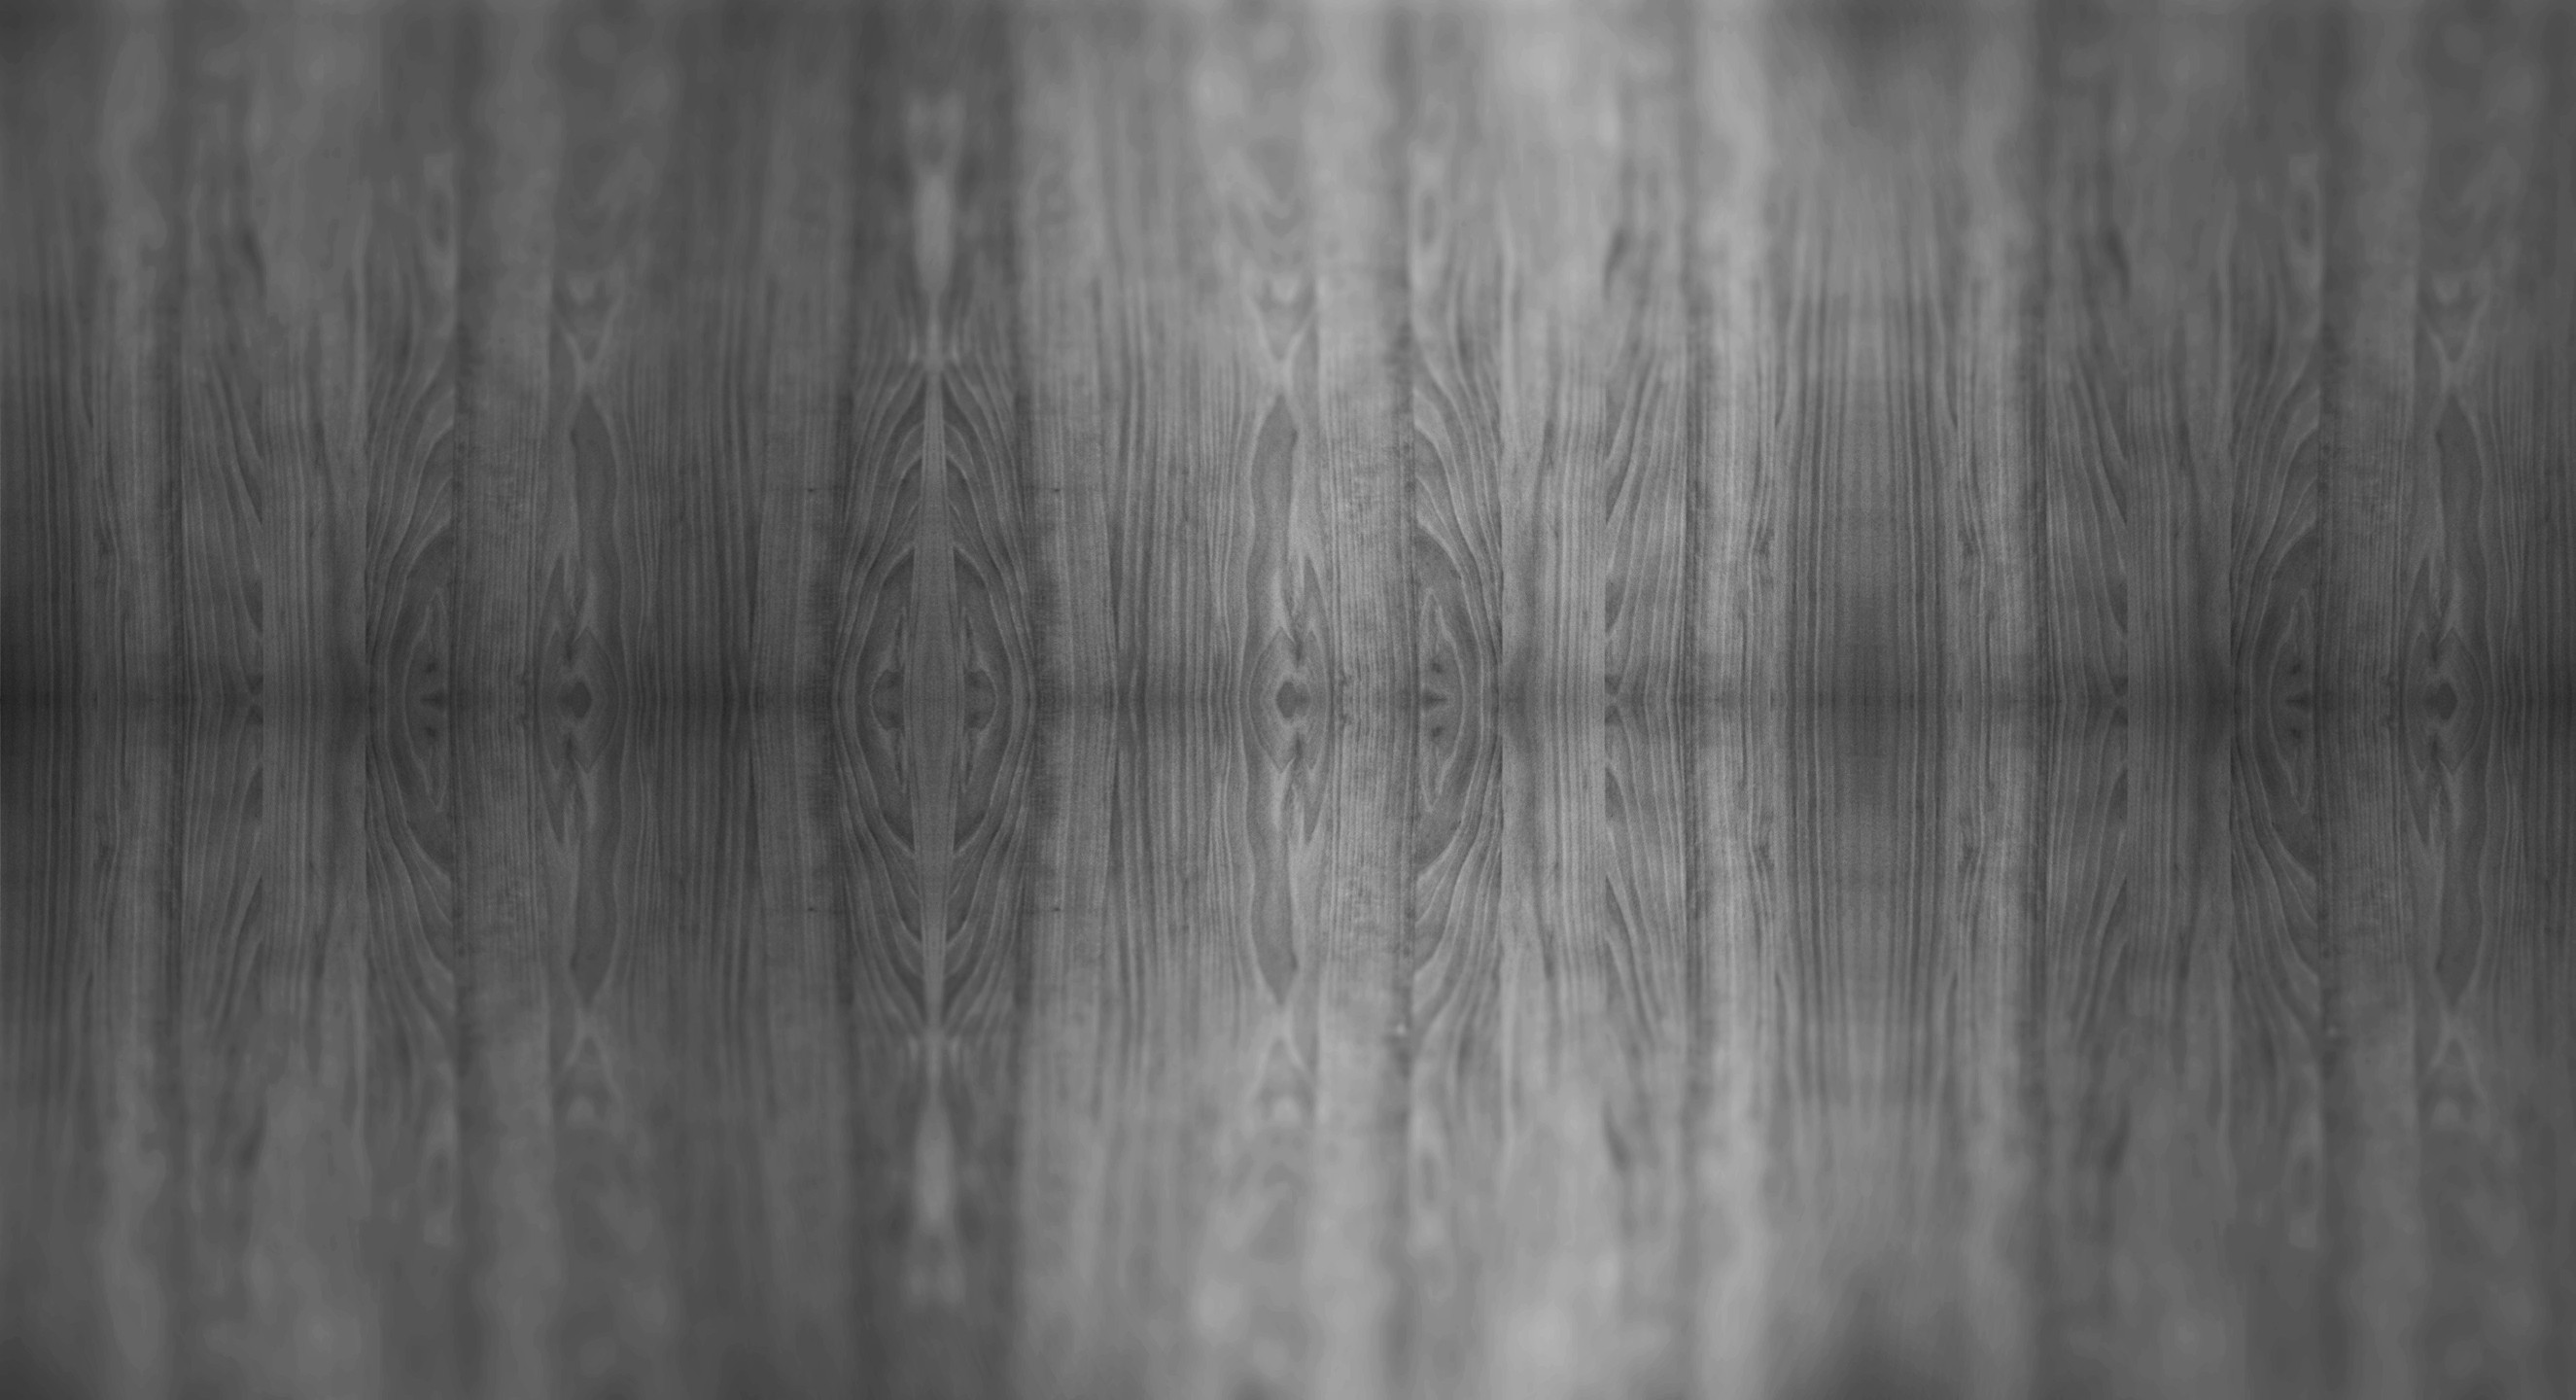 Explore Wood Wallpaper, Grey Wood, and more!